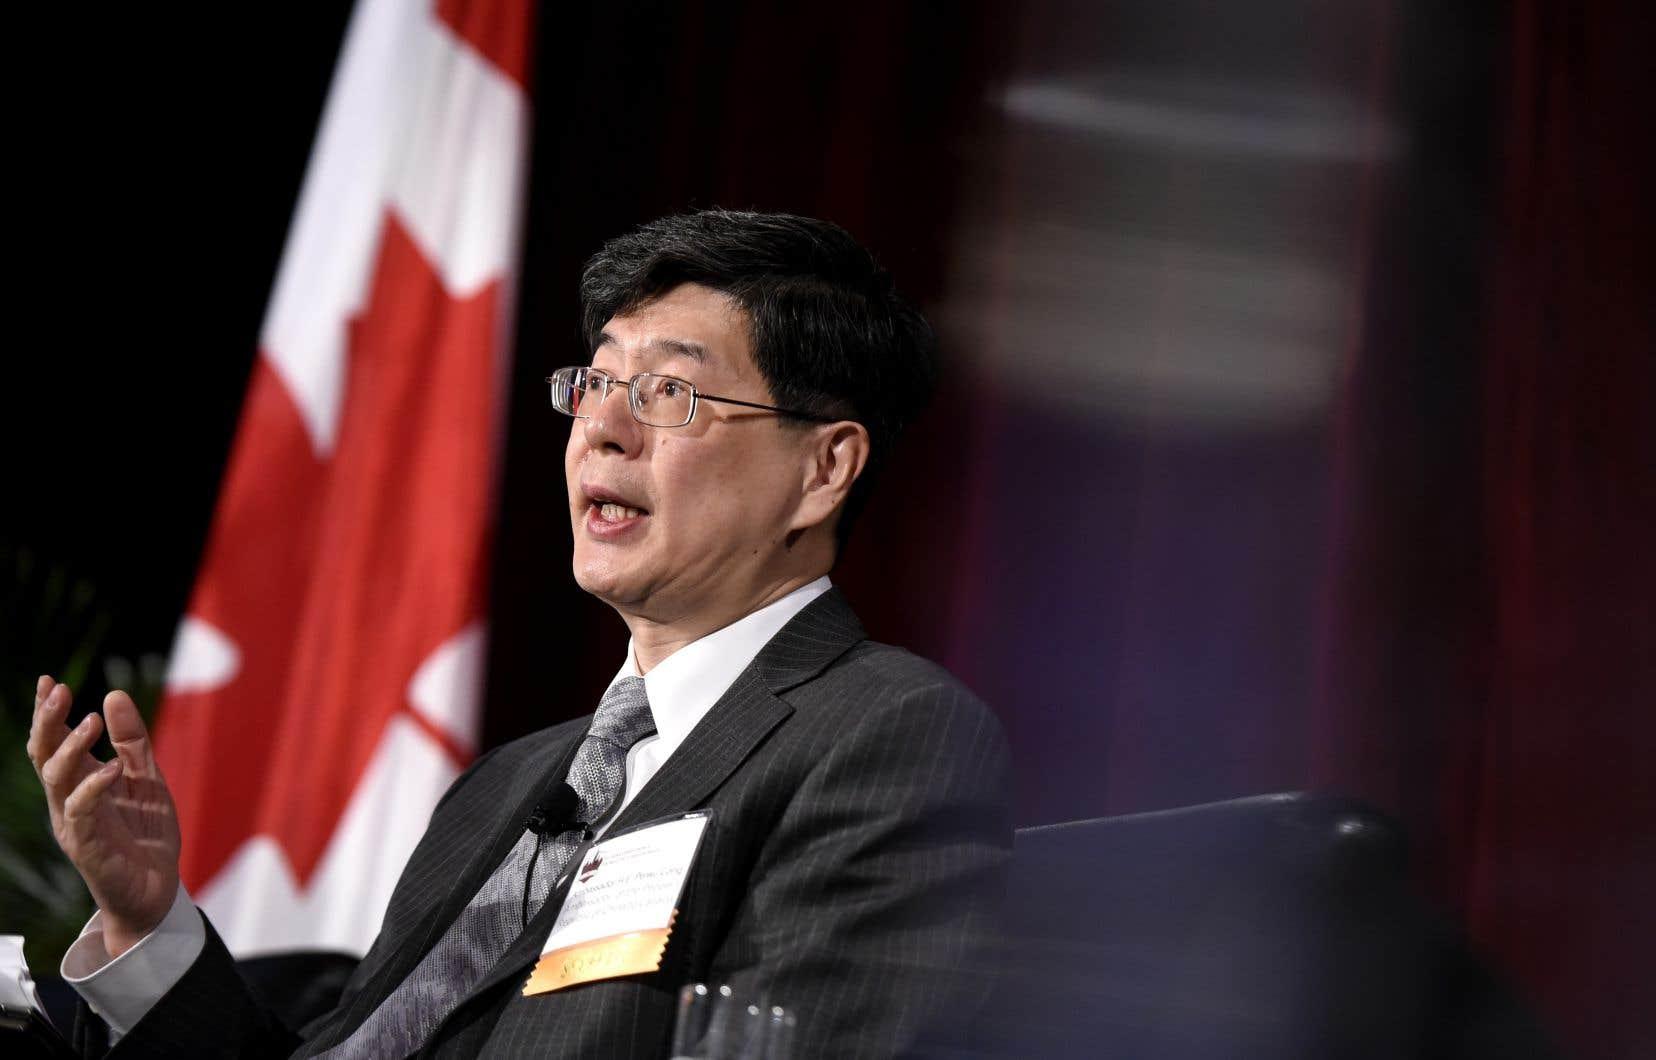 L'ambassadeur de Chine au Canada, Cong Peiwu